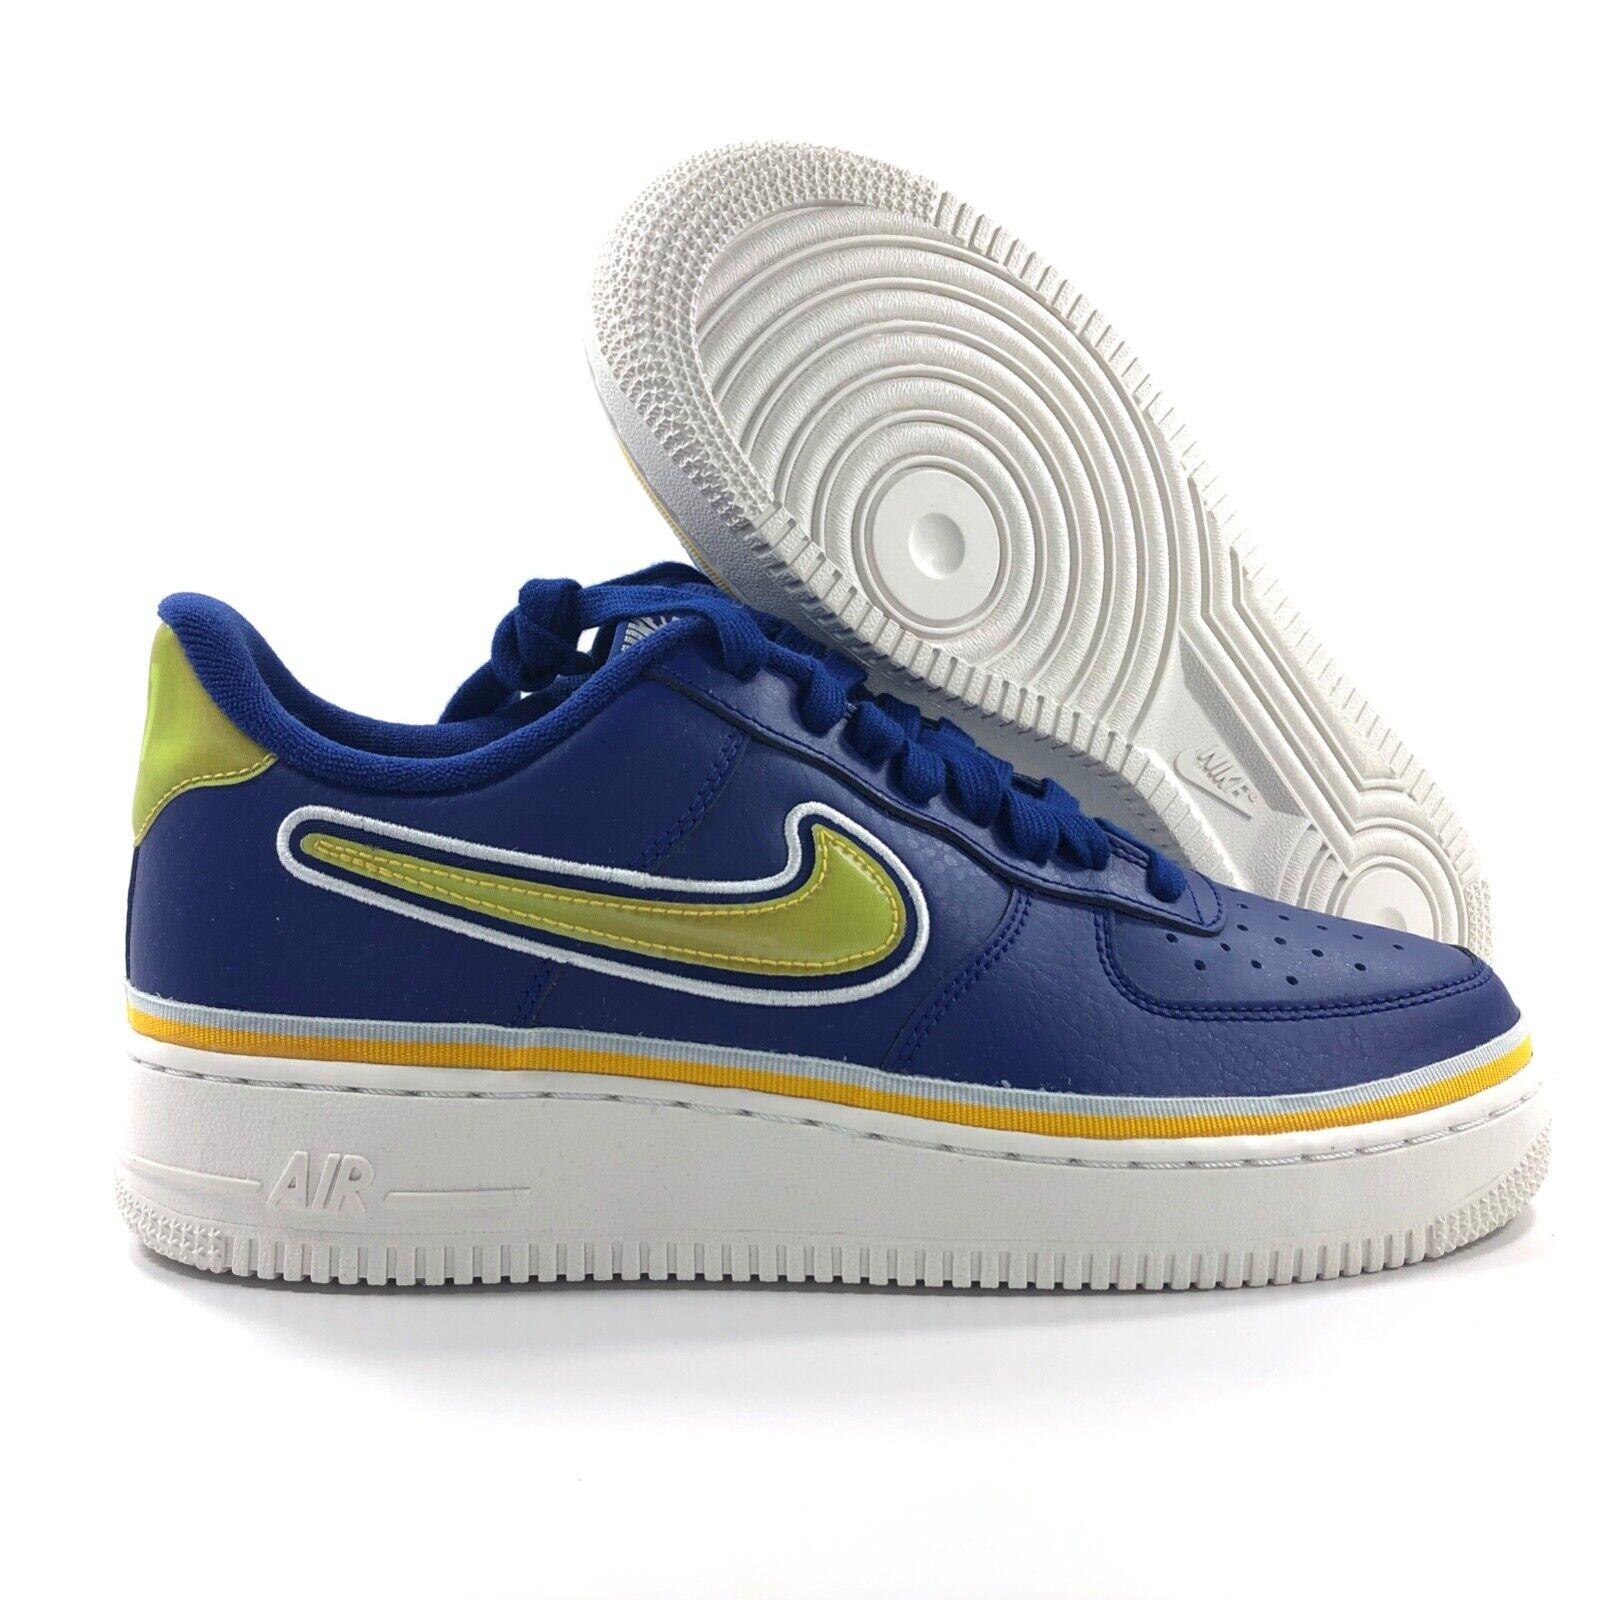 Nike Air Force 1 '07 LV8 Sport NBA Warriors Blue Gold AJ7748 400 Men's 10 12